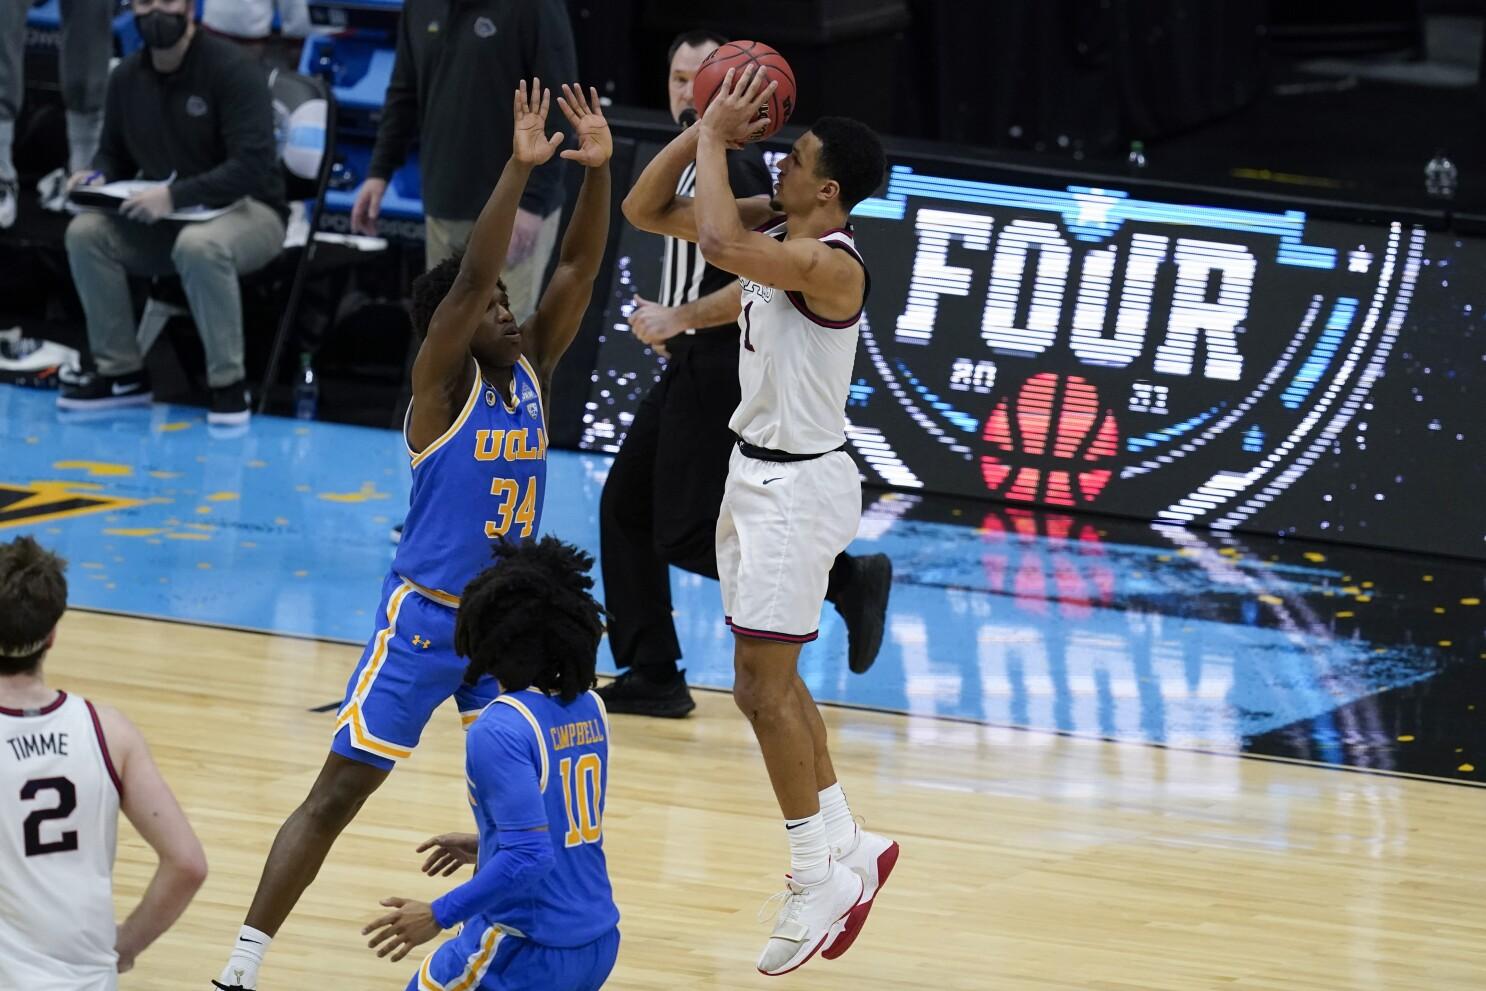 UCLA falls to Gonzaga at buzzer in OT